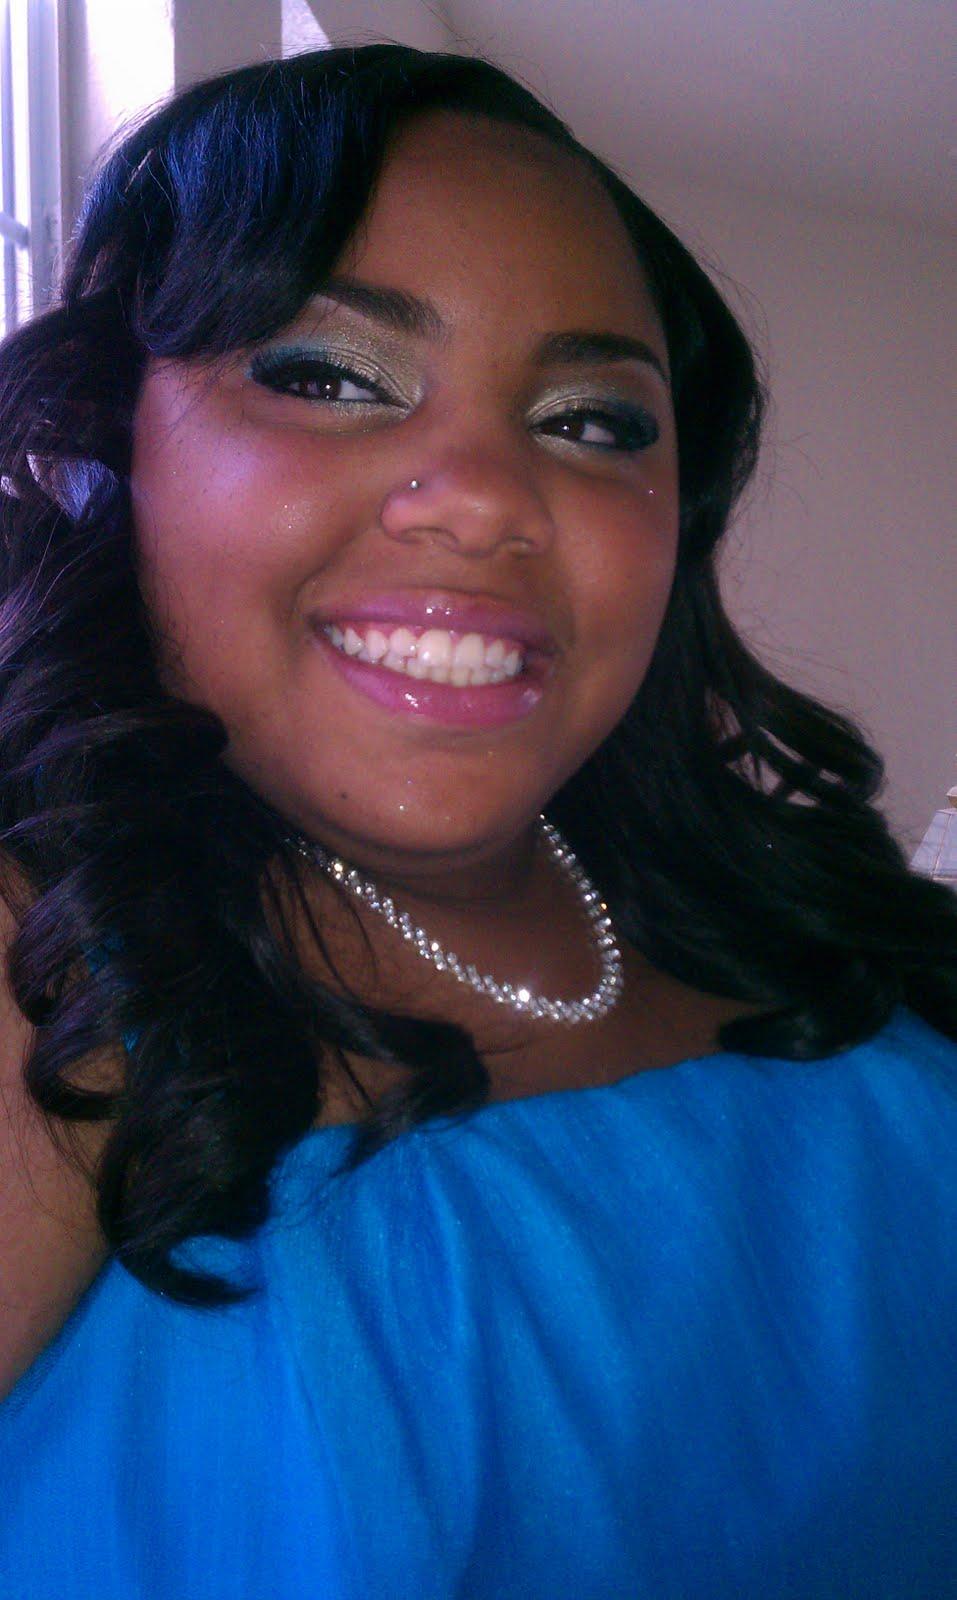 corset wedding gown,